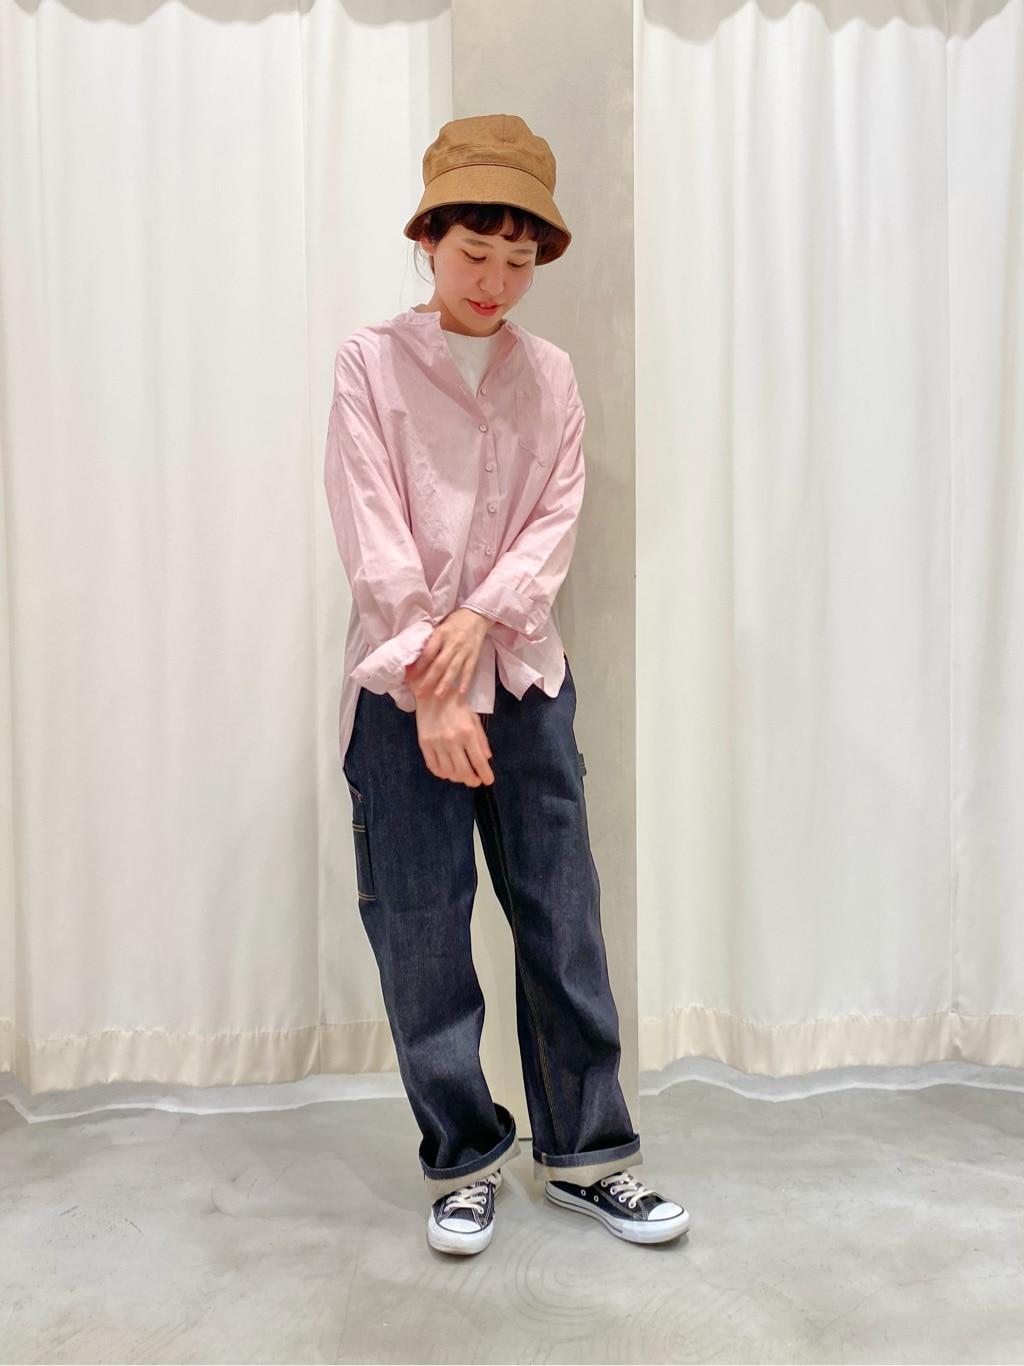 CHILD WOMAN , PAR ICI 東京スカイツリータウン・ソラマチ 2021.05.01